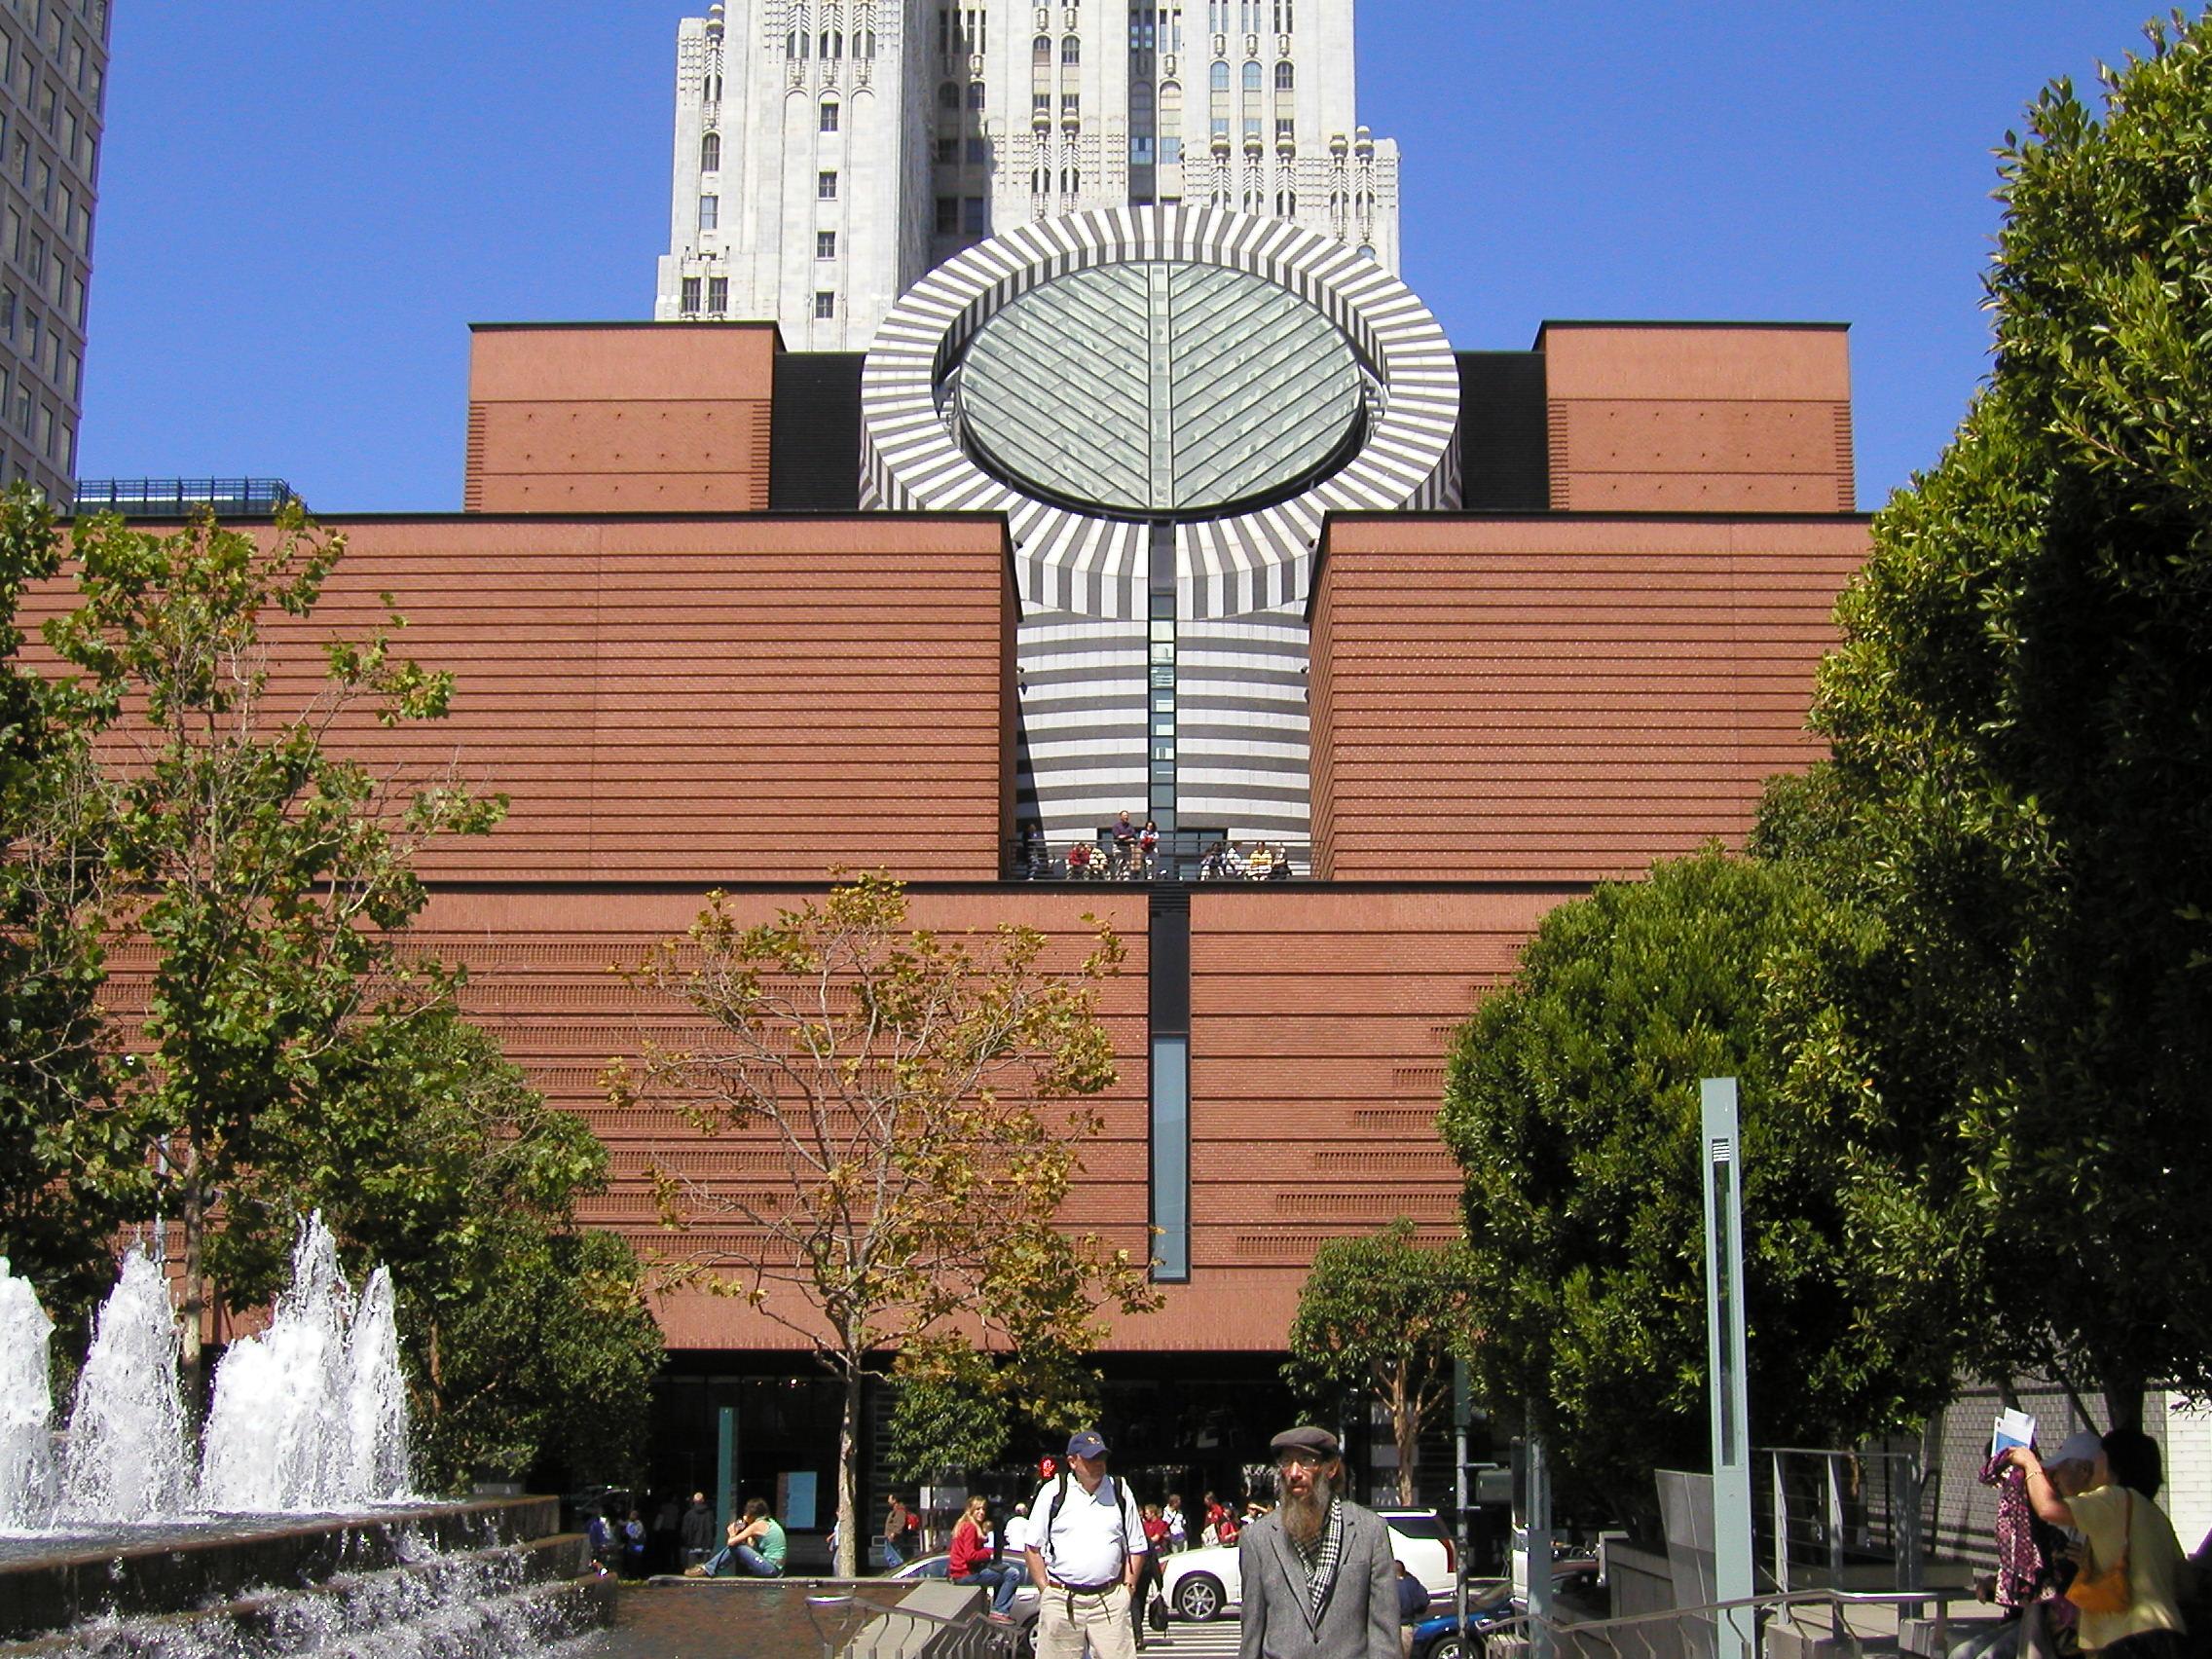 Walton arts center details plans for renovated complex for San francisco museum modern art